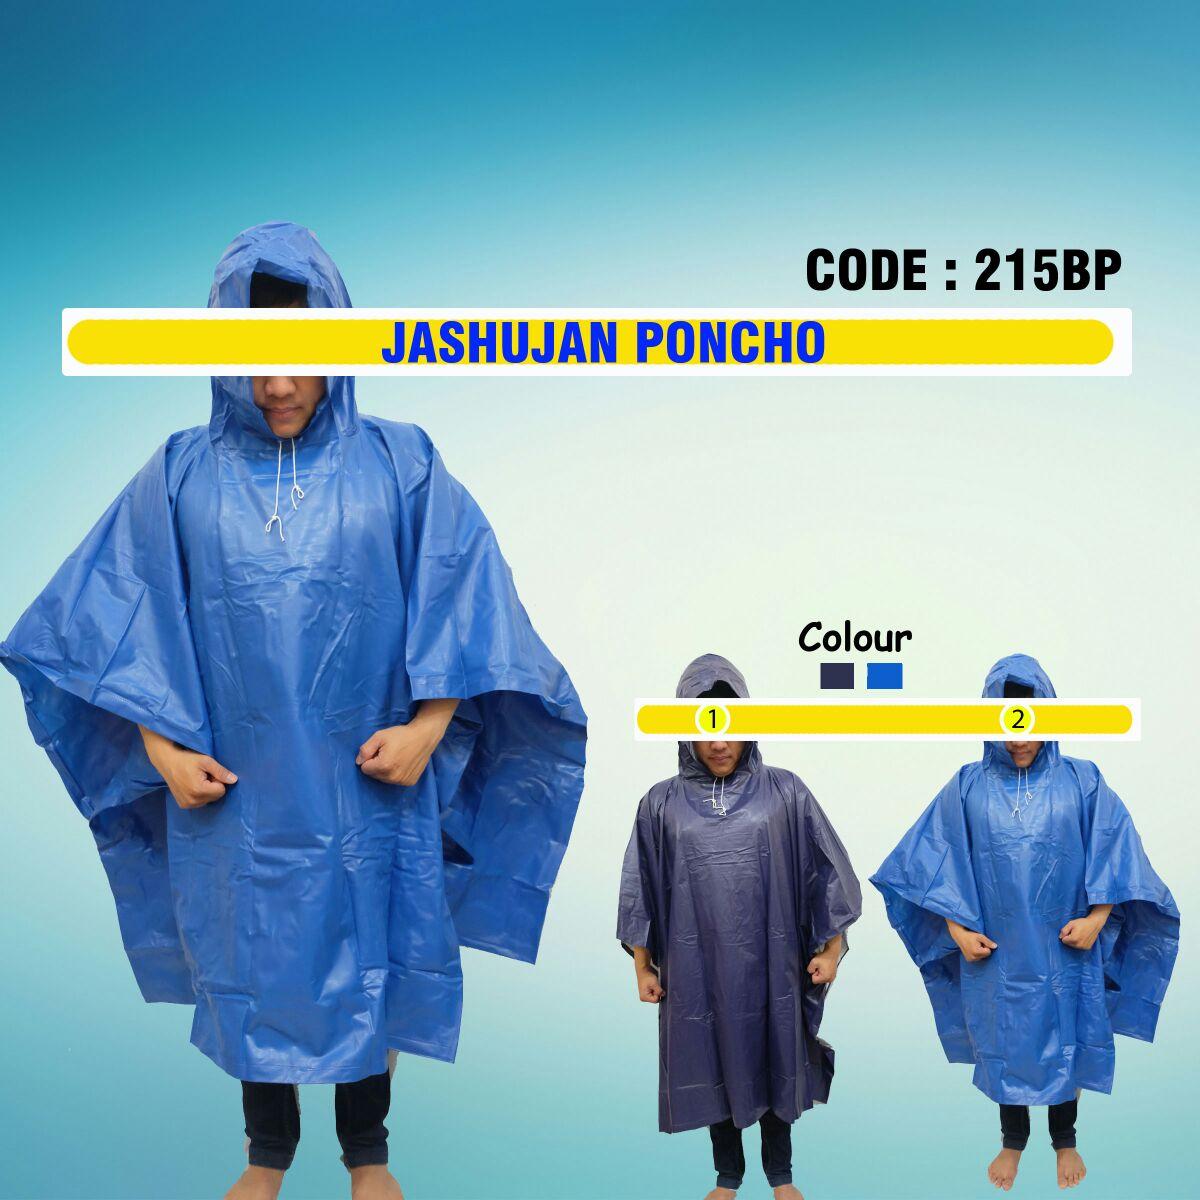 Jas hujan Poncho Code 215BP